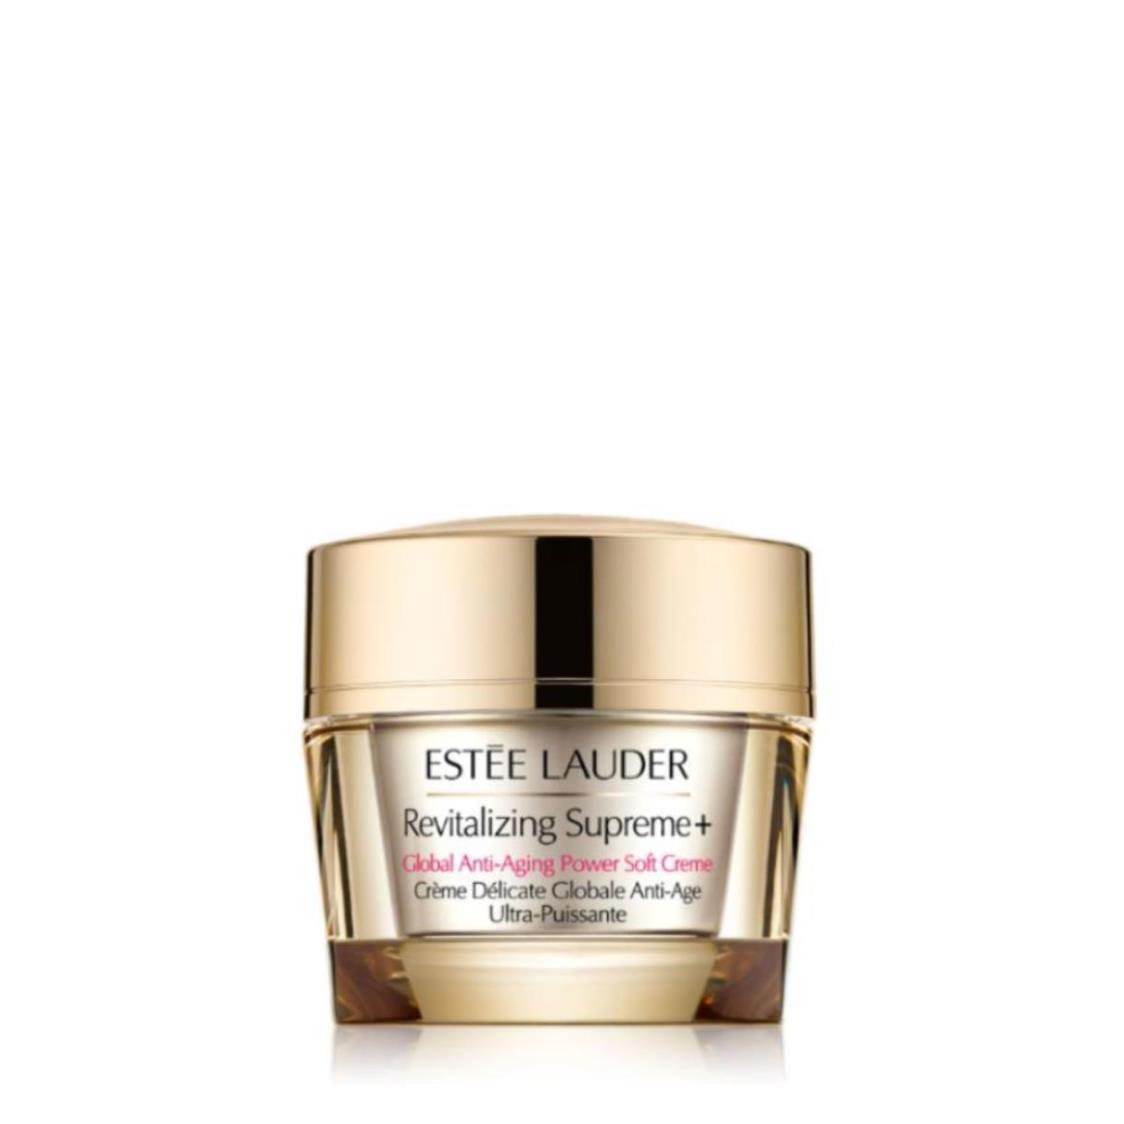 Estee Lauder Revitalizing Supreme  Global Anti-Aging Power Soft Creme 75ml